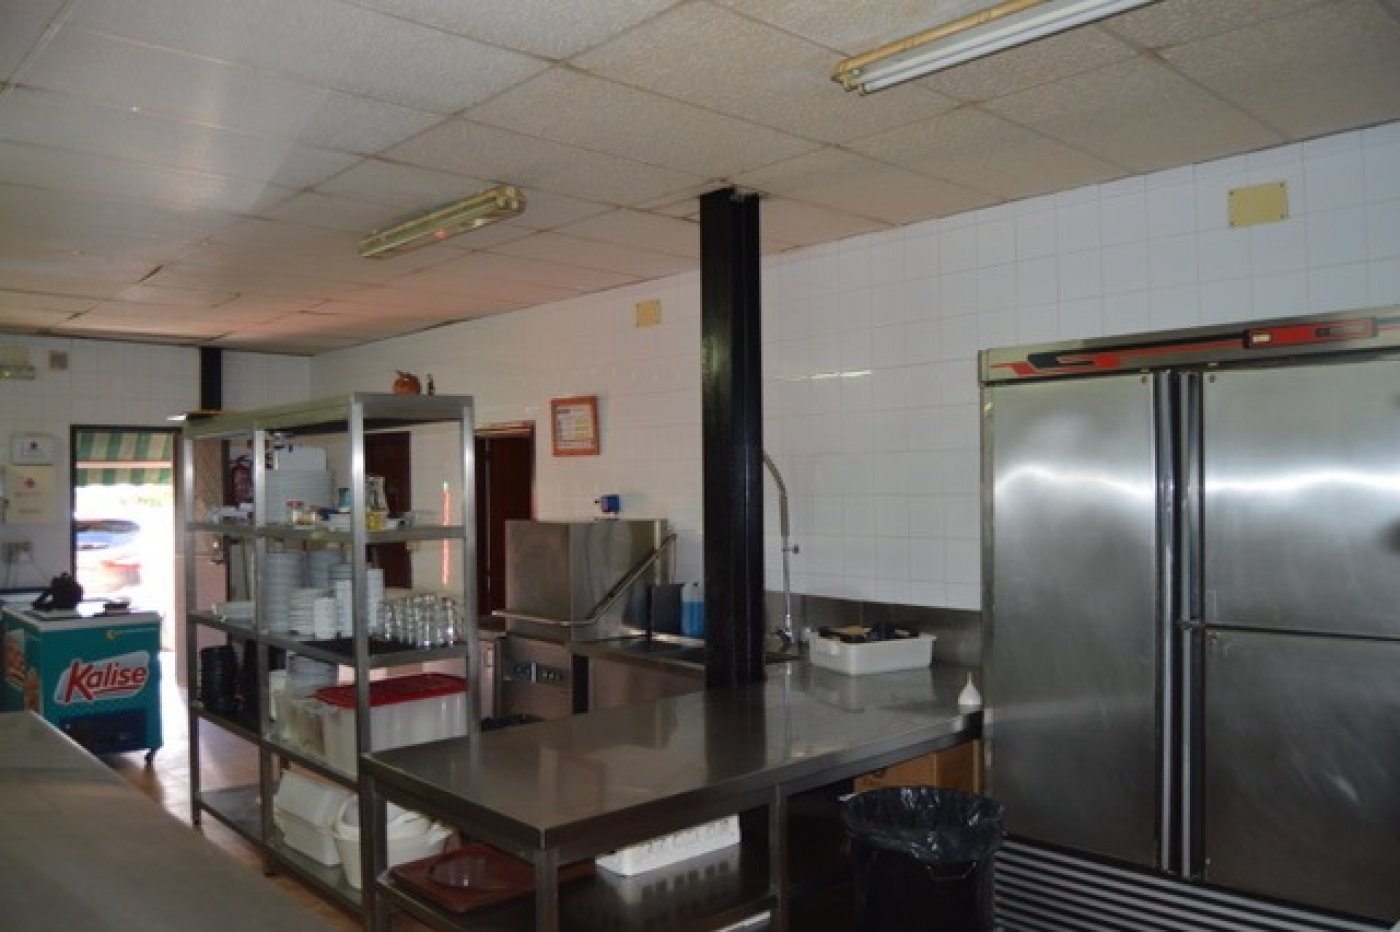 Nave restaurante en polígono cerca de sant sadurní d´anoia - imagenInmueble33